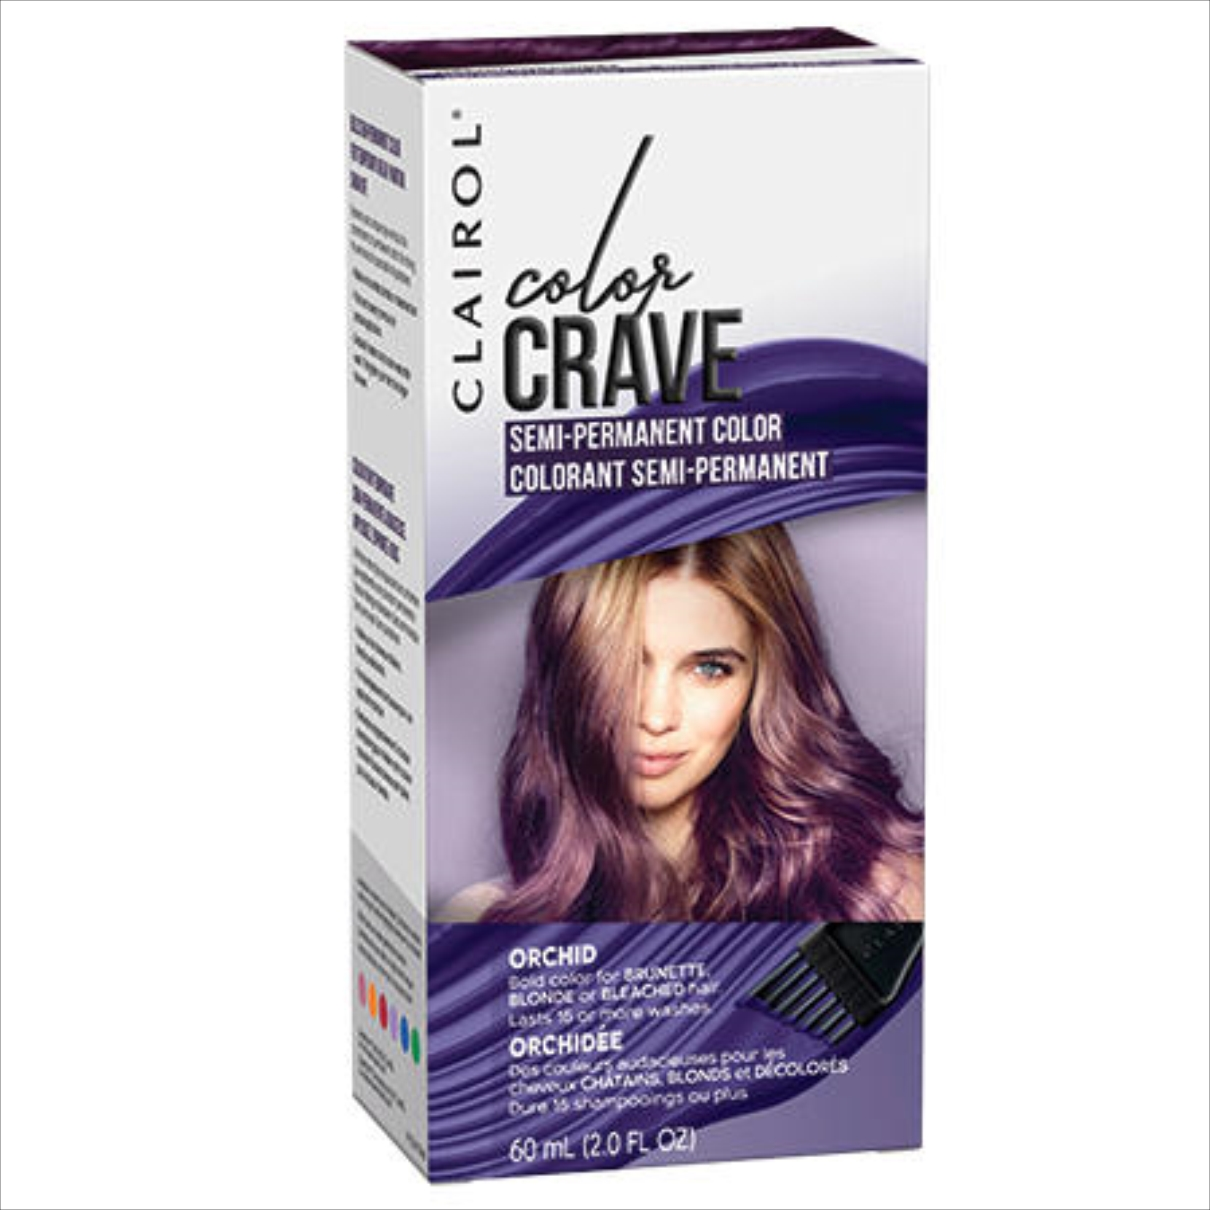 Semi Permanent Hair Color Clairol